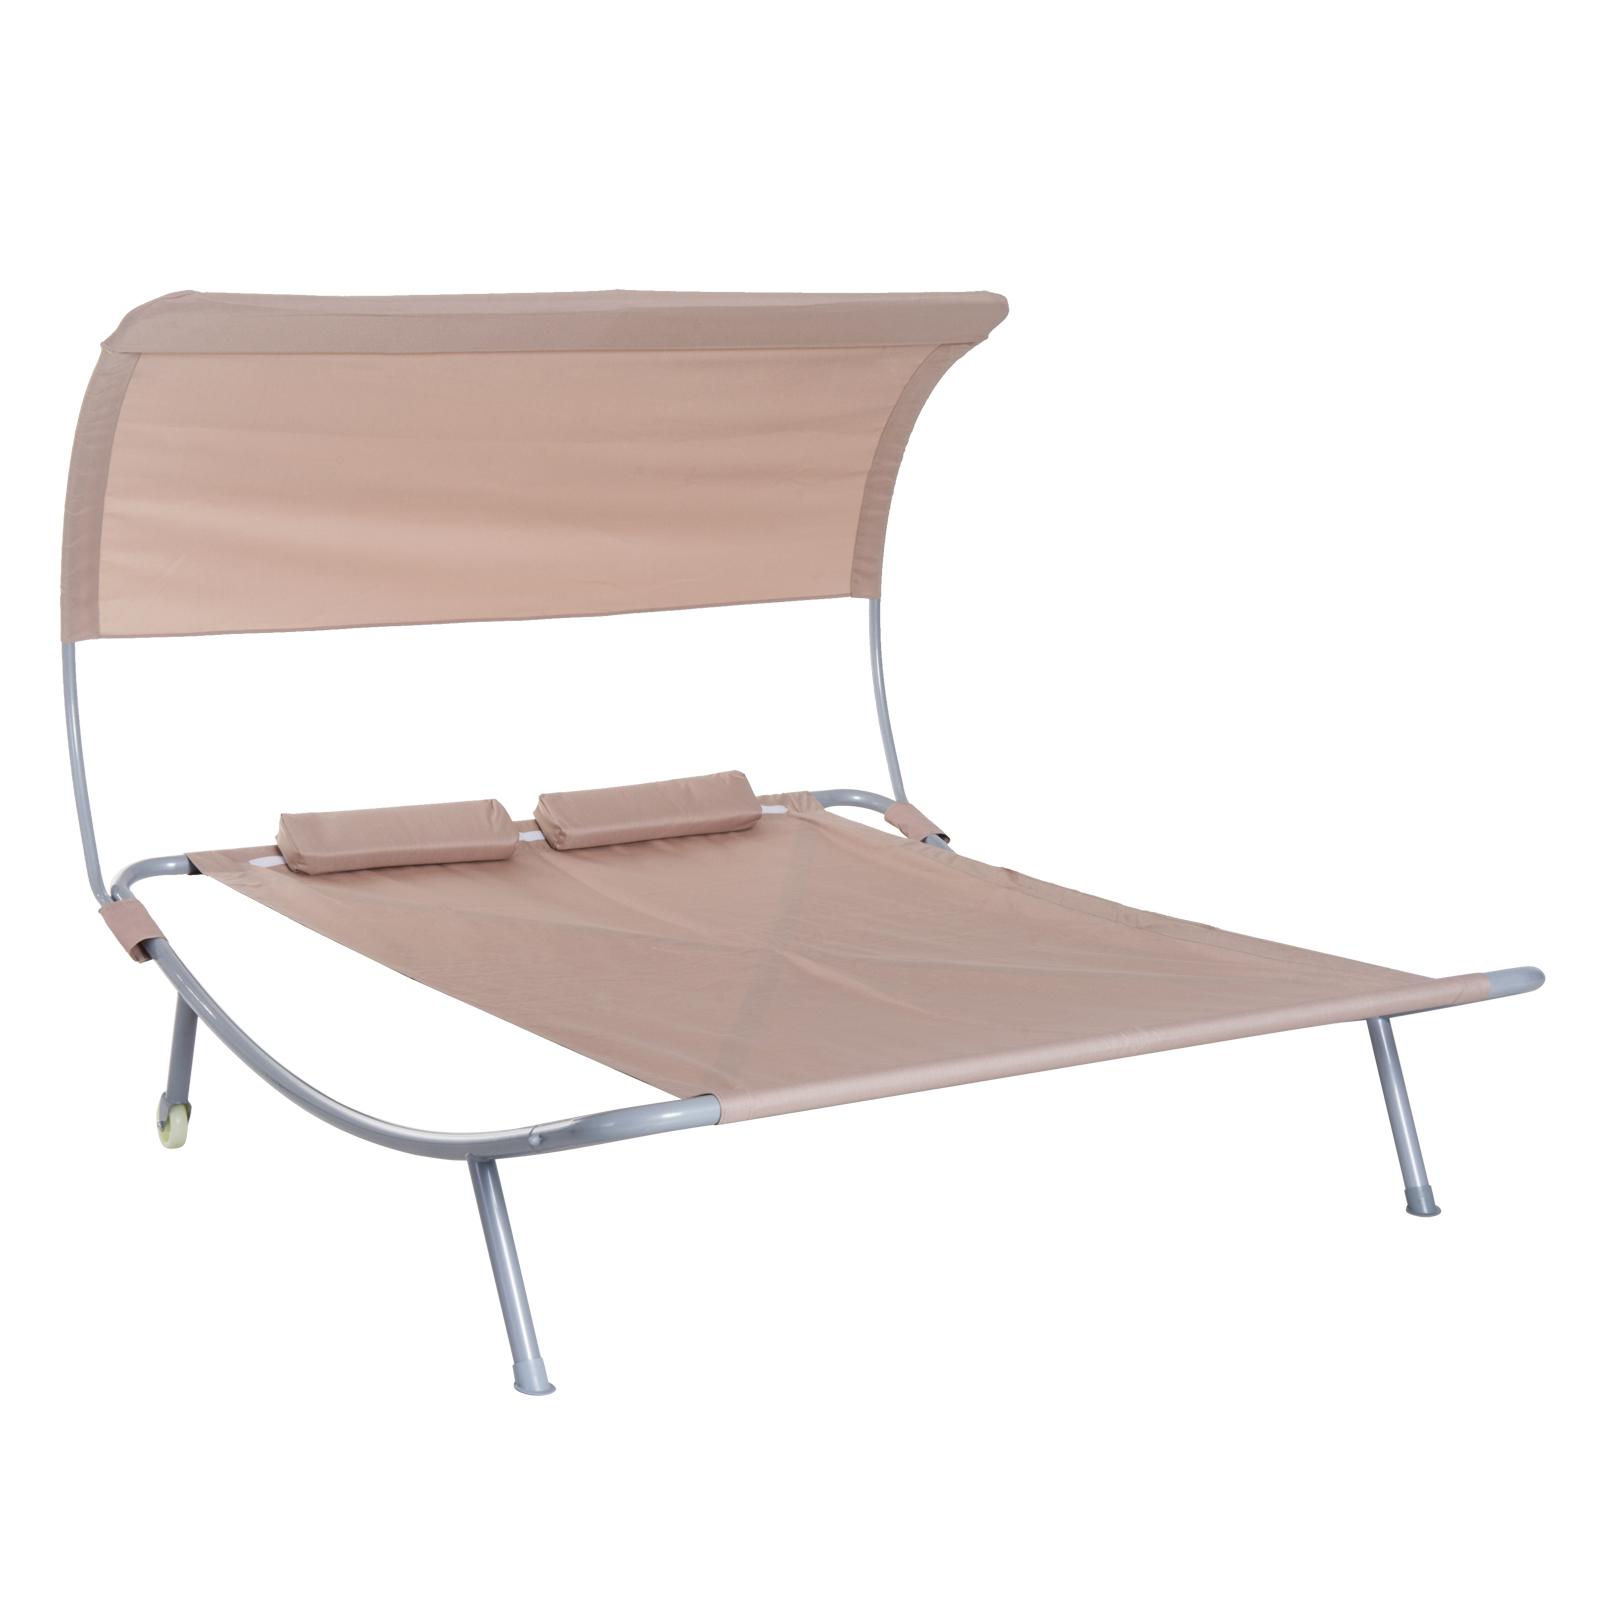 Outsunny Doppelliege Sonnenliege Relaxliege mit Dach rollbar Stahl 3 Farben